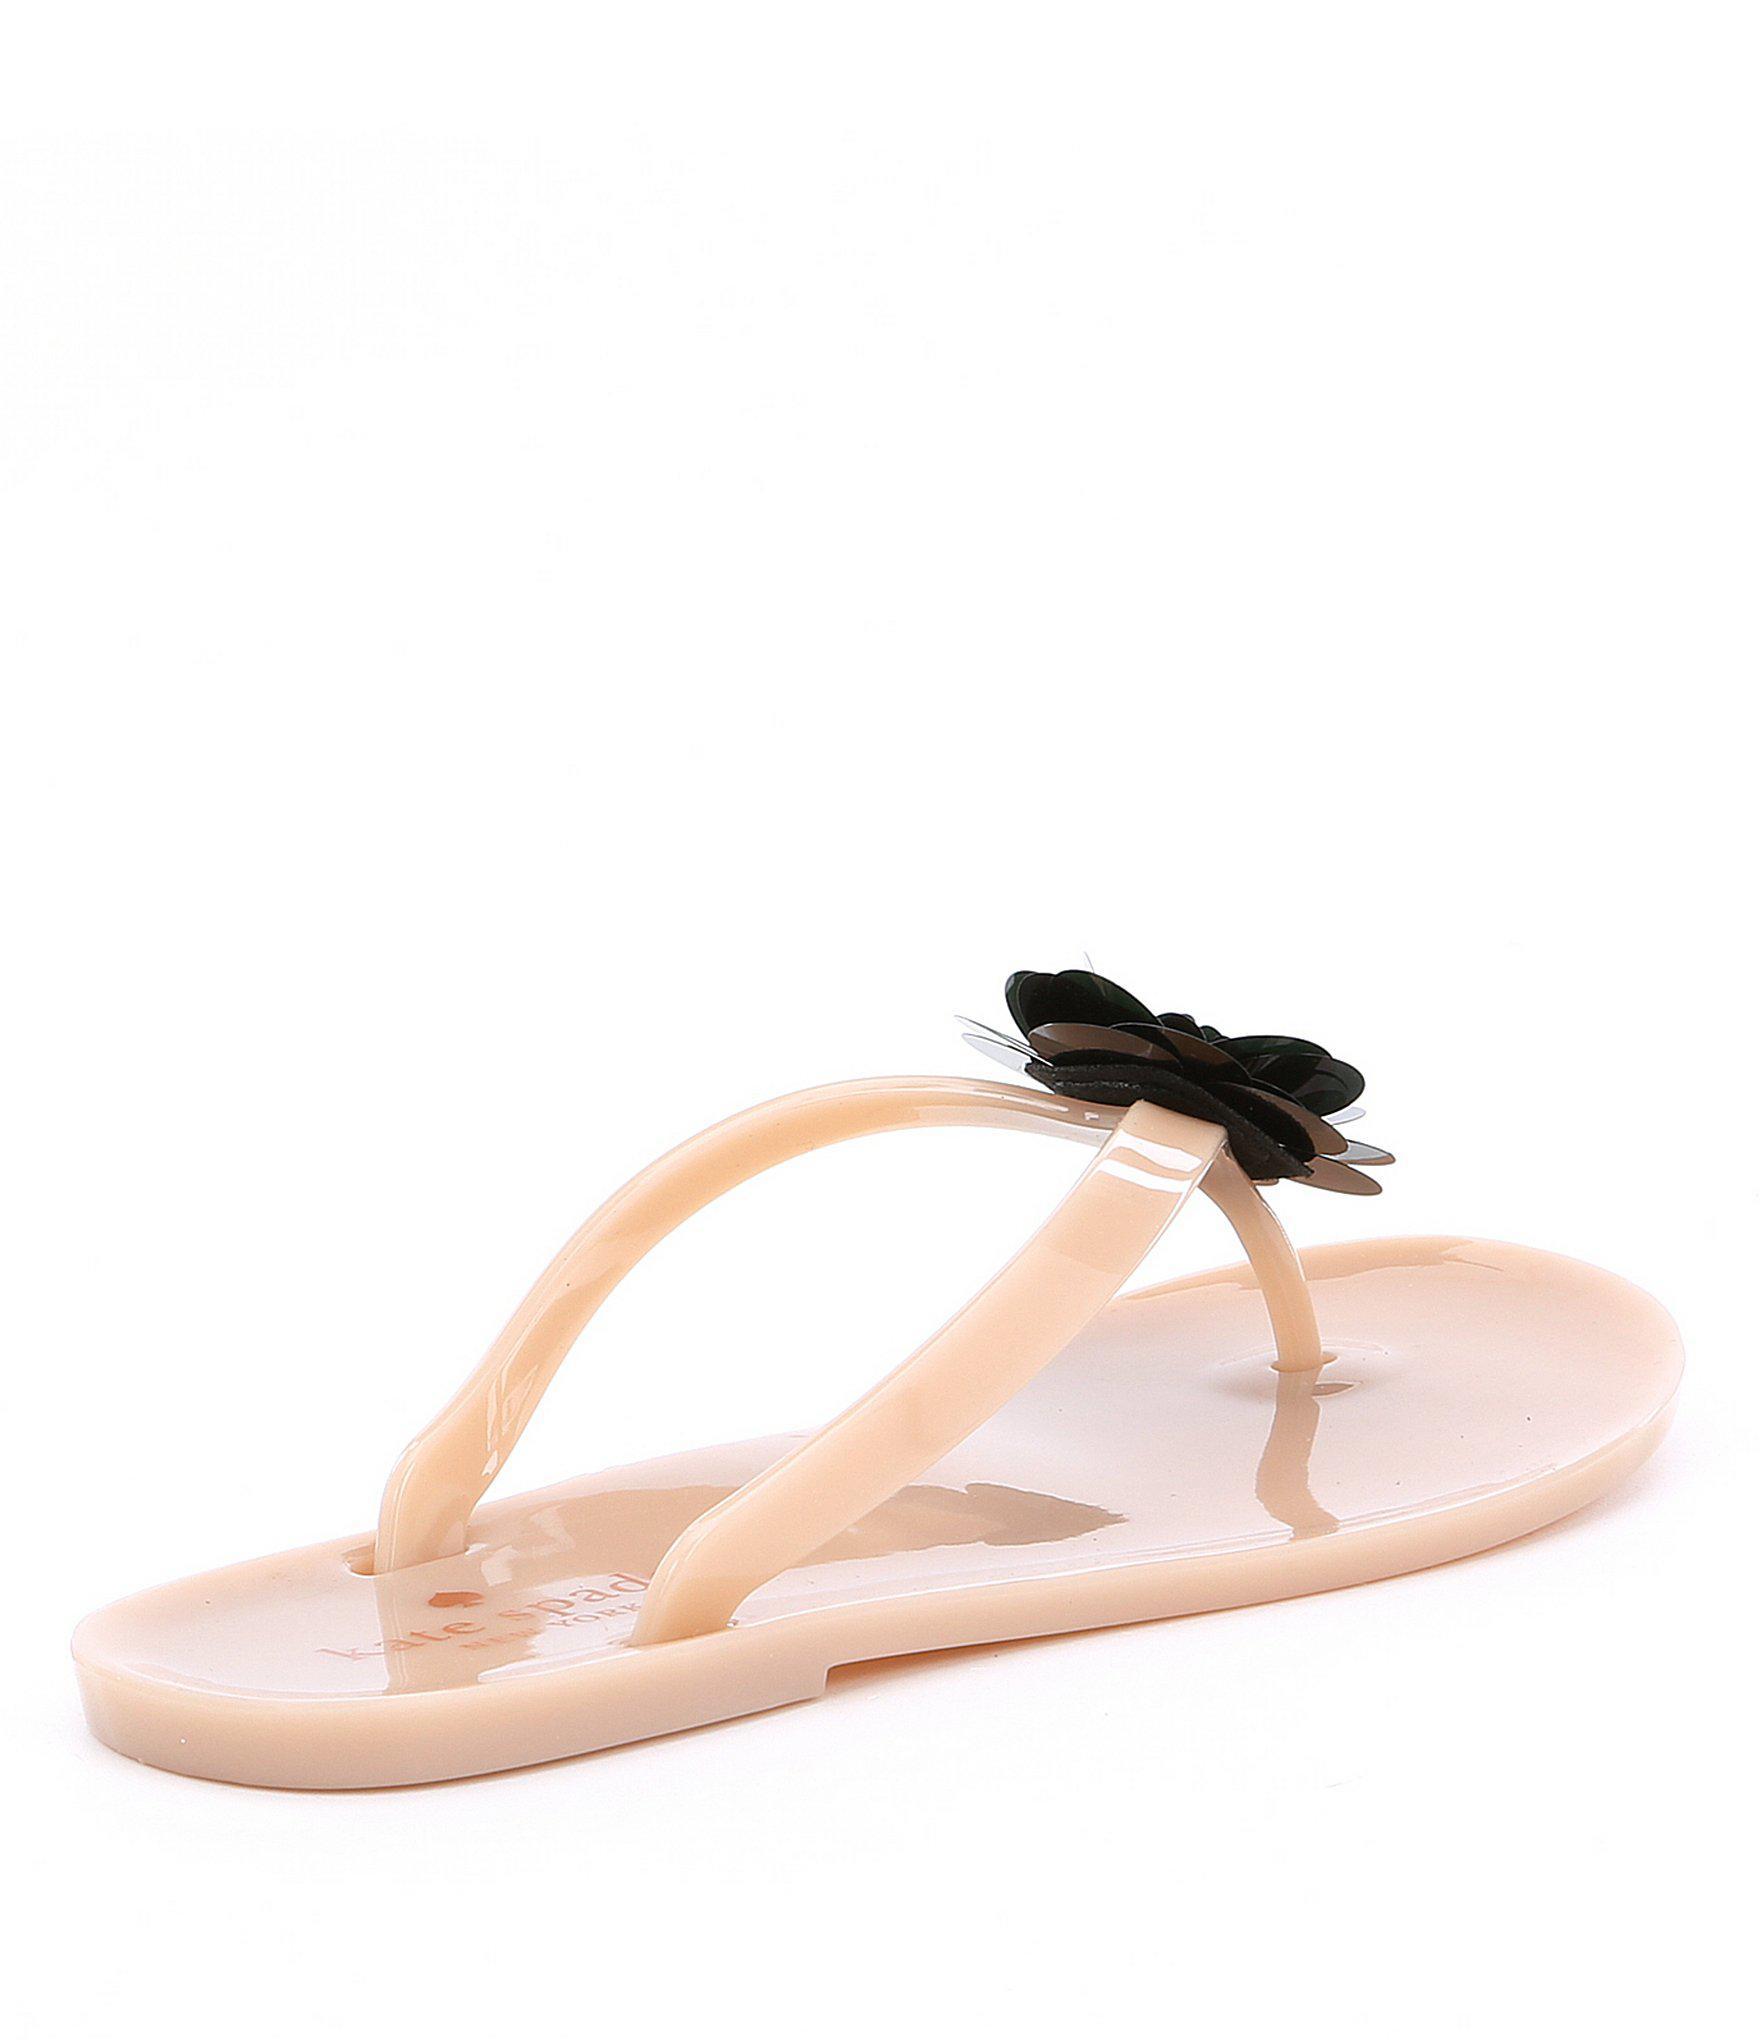 2e7597dbfe74 Lyst - Kate Spade Fiorina Flower Jelly Flip Flops in Pink